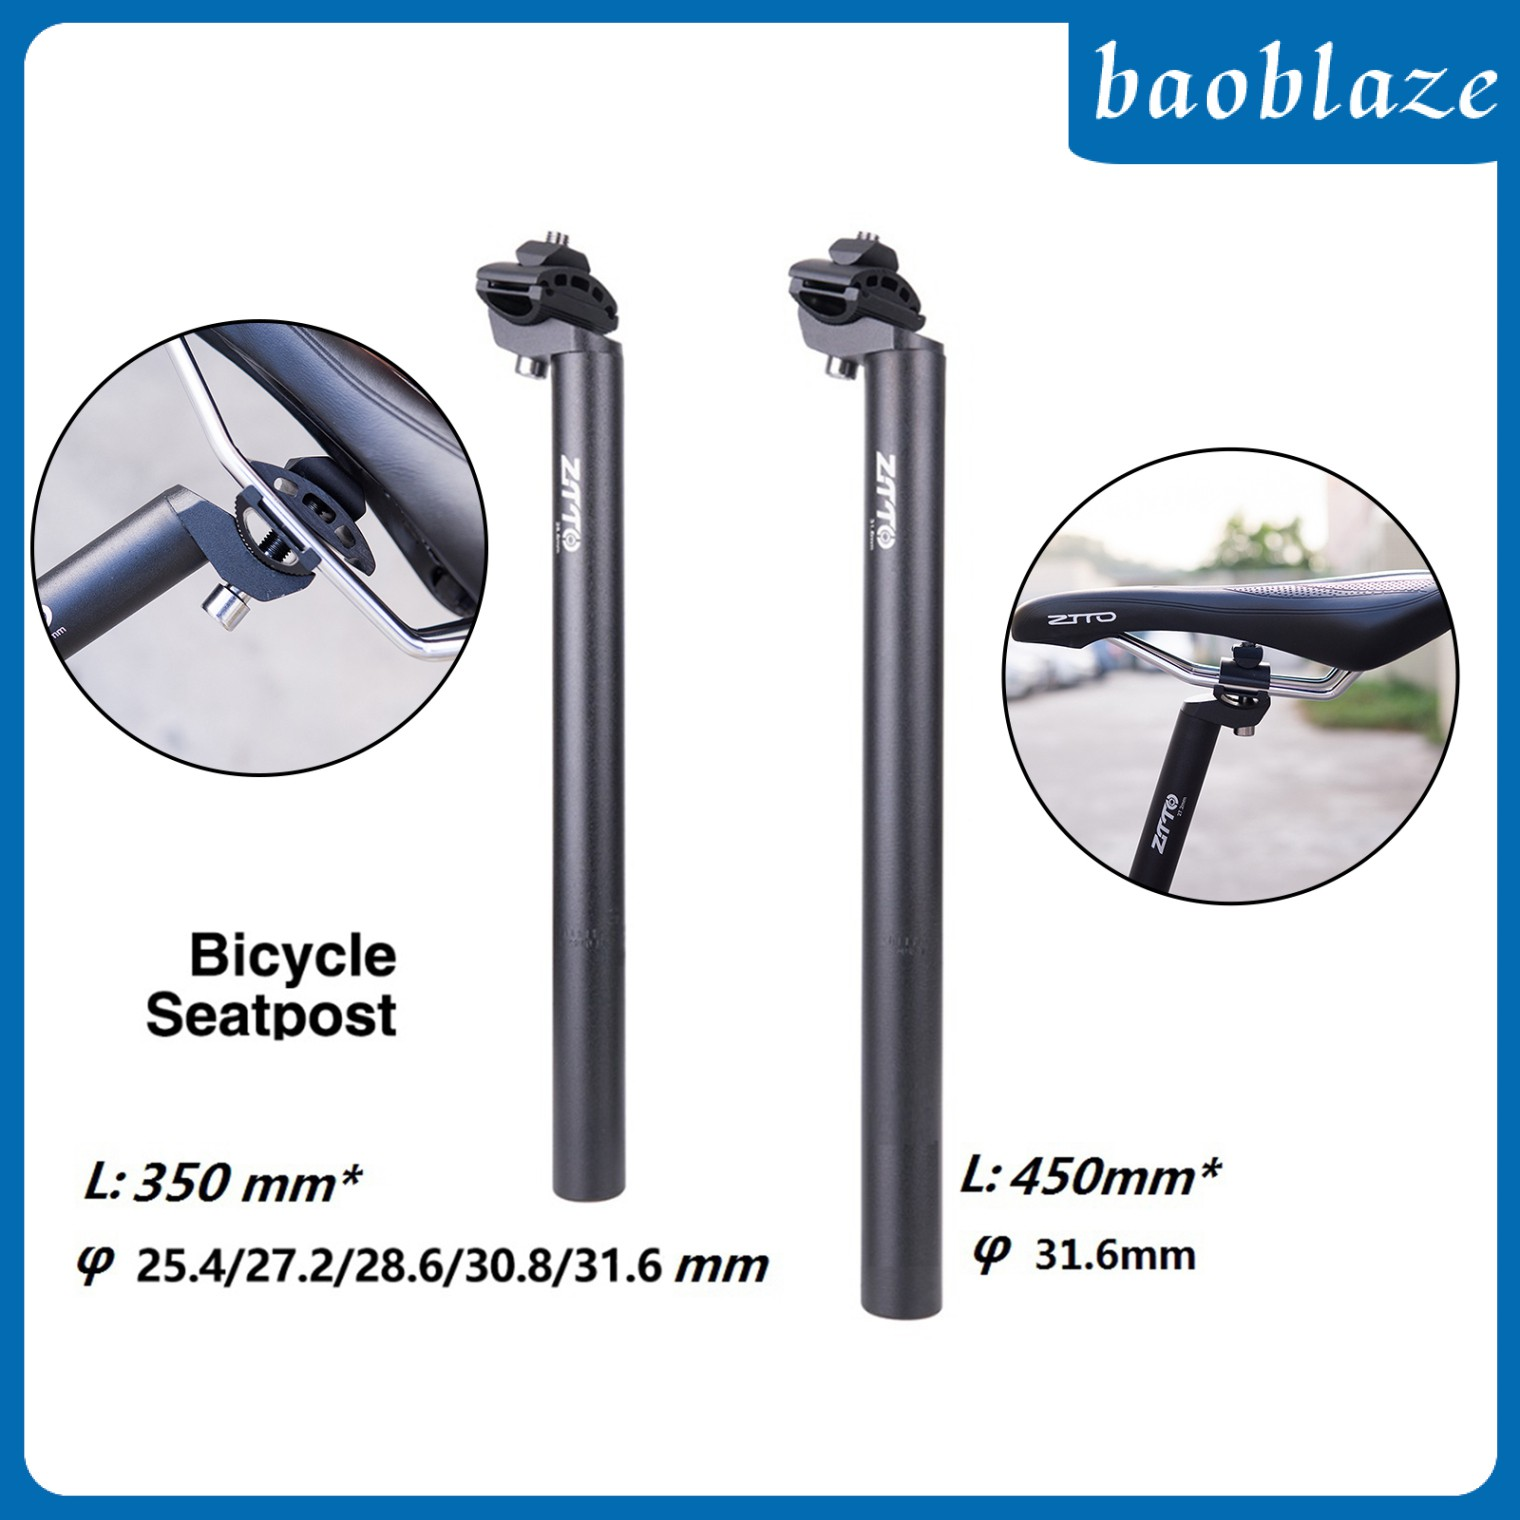 25.4//27.2//28.6//30.8//31.6mm Bicycle Seatpost 350mm 450mm Adjustable Seatpost